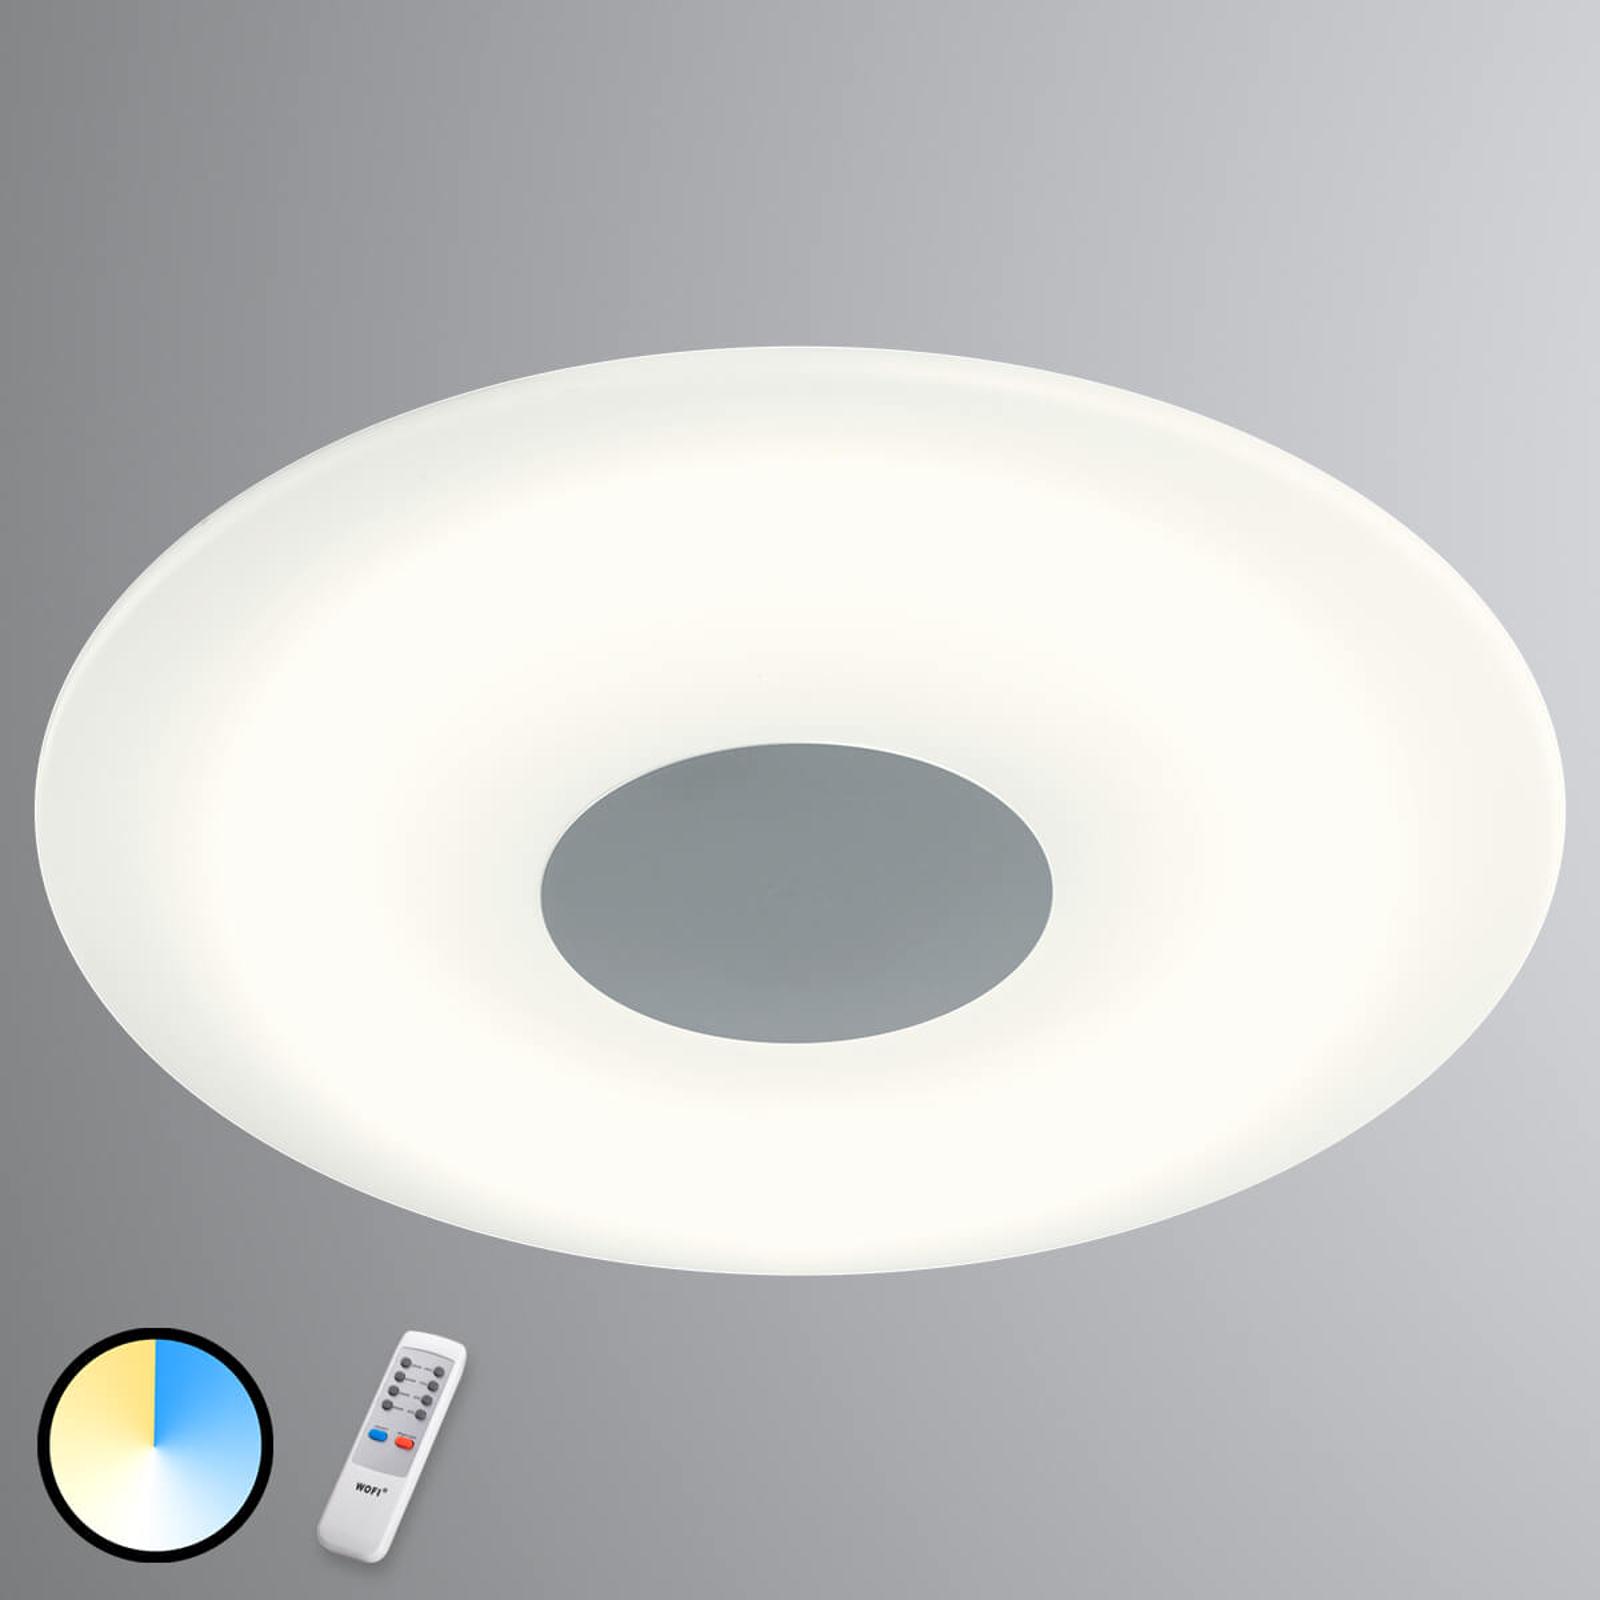 LED-plafondlamp Kara met variabele lichtkleur